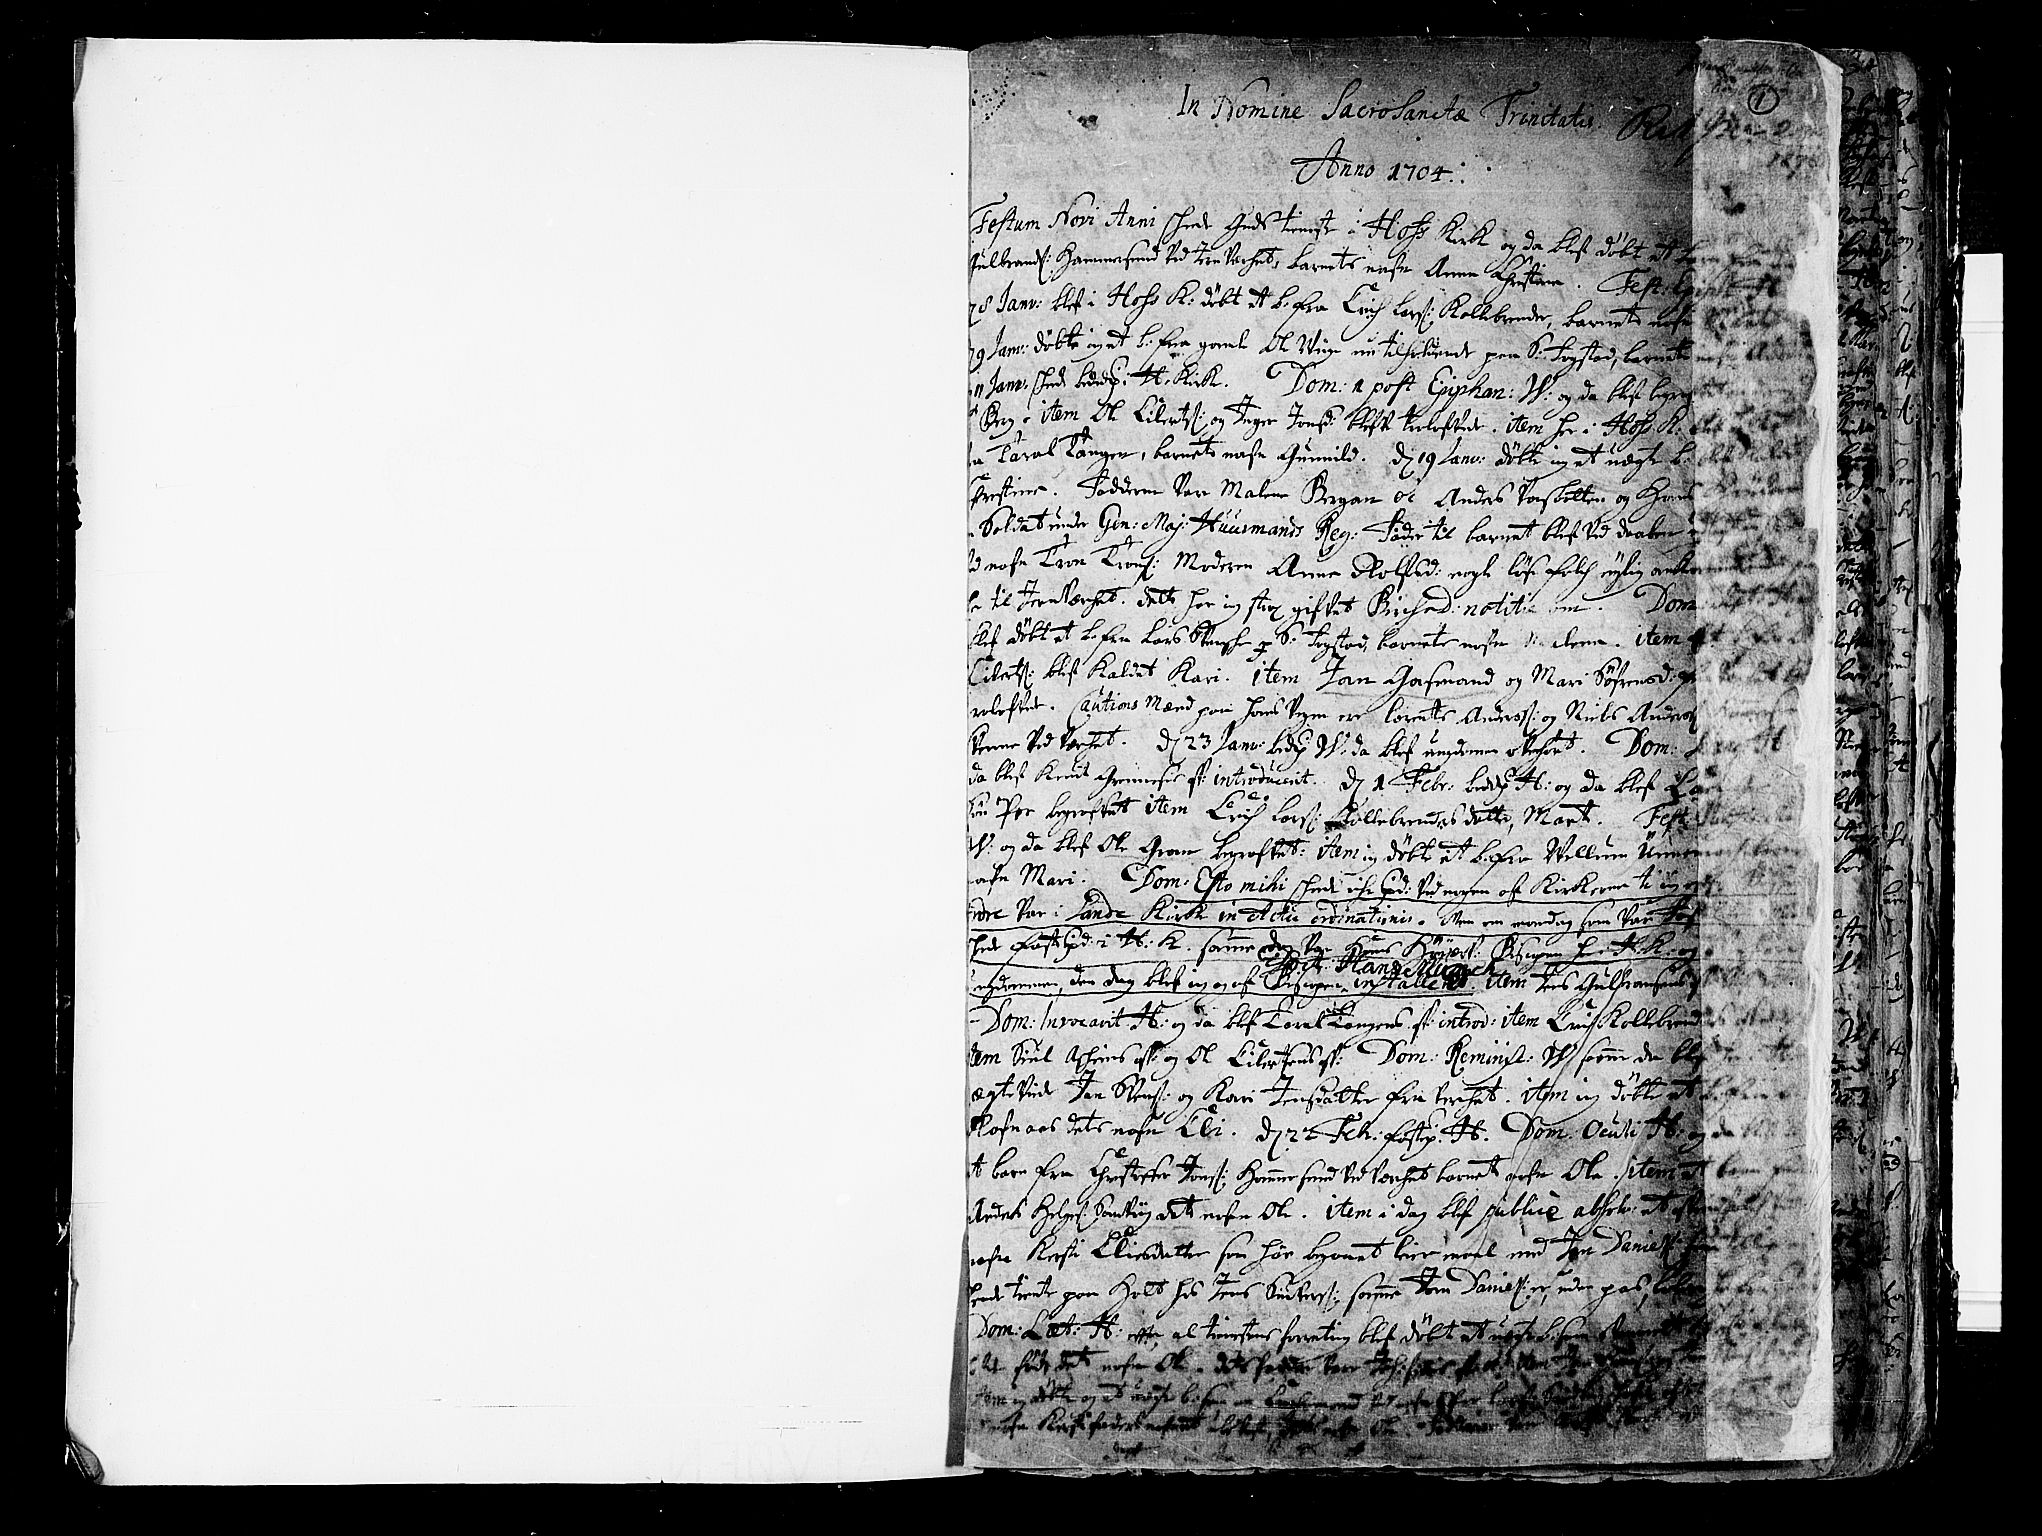 SAKO, Hof kirkebøker, F/Fa/L0001: Ministerialbok nr. I 1, 1704-1745, s. 1